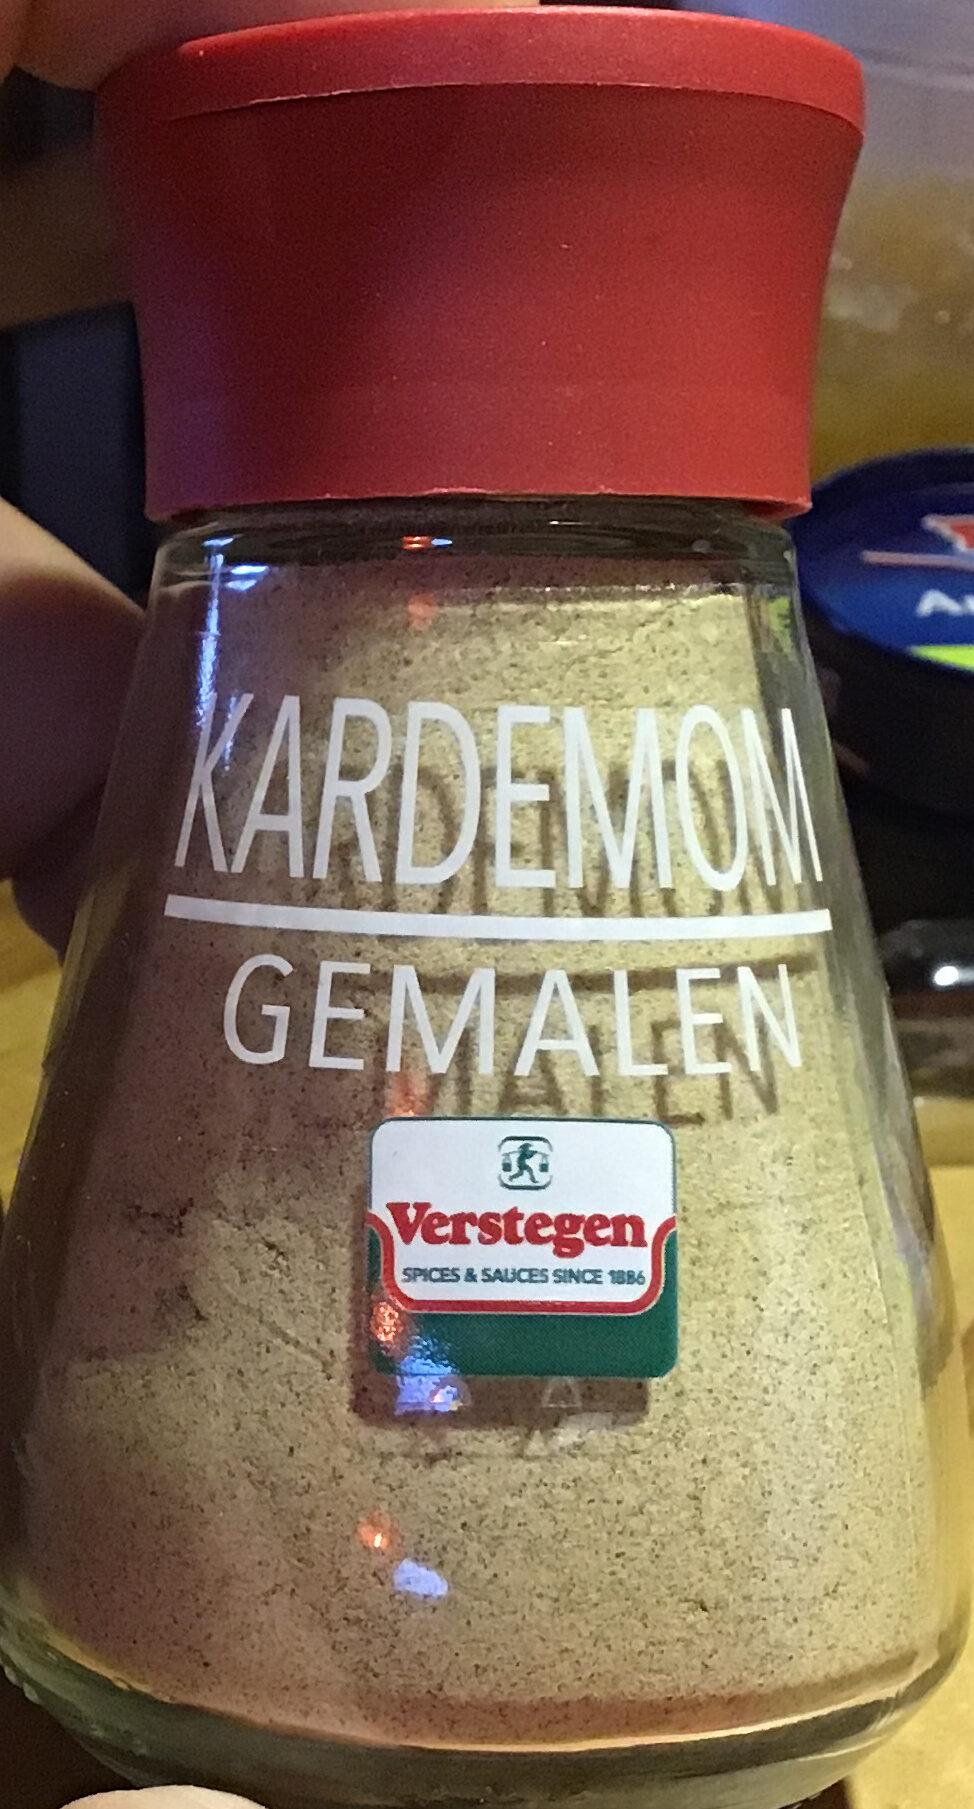 Verstegen Kardemom gemalen - Product - nl